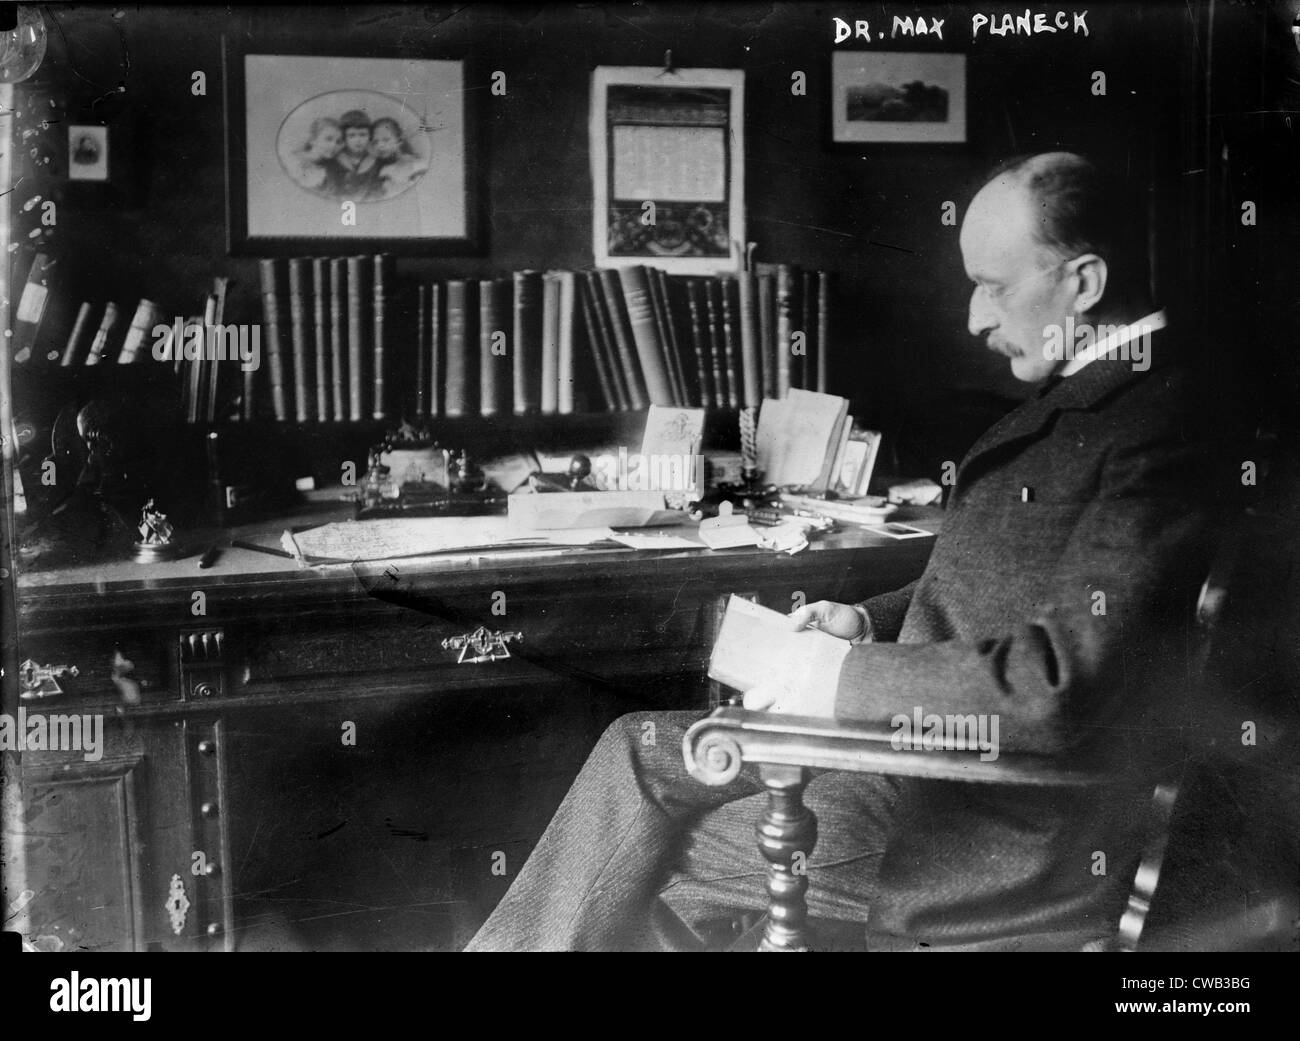 Max Planck (1858-1947), German physicist, circa 1930s. - Stock Image